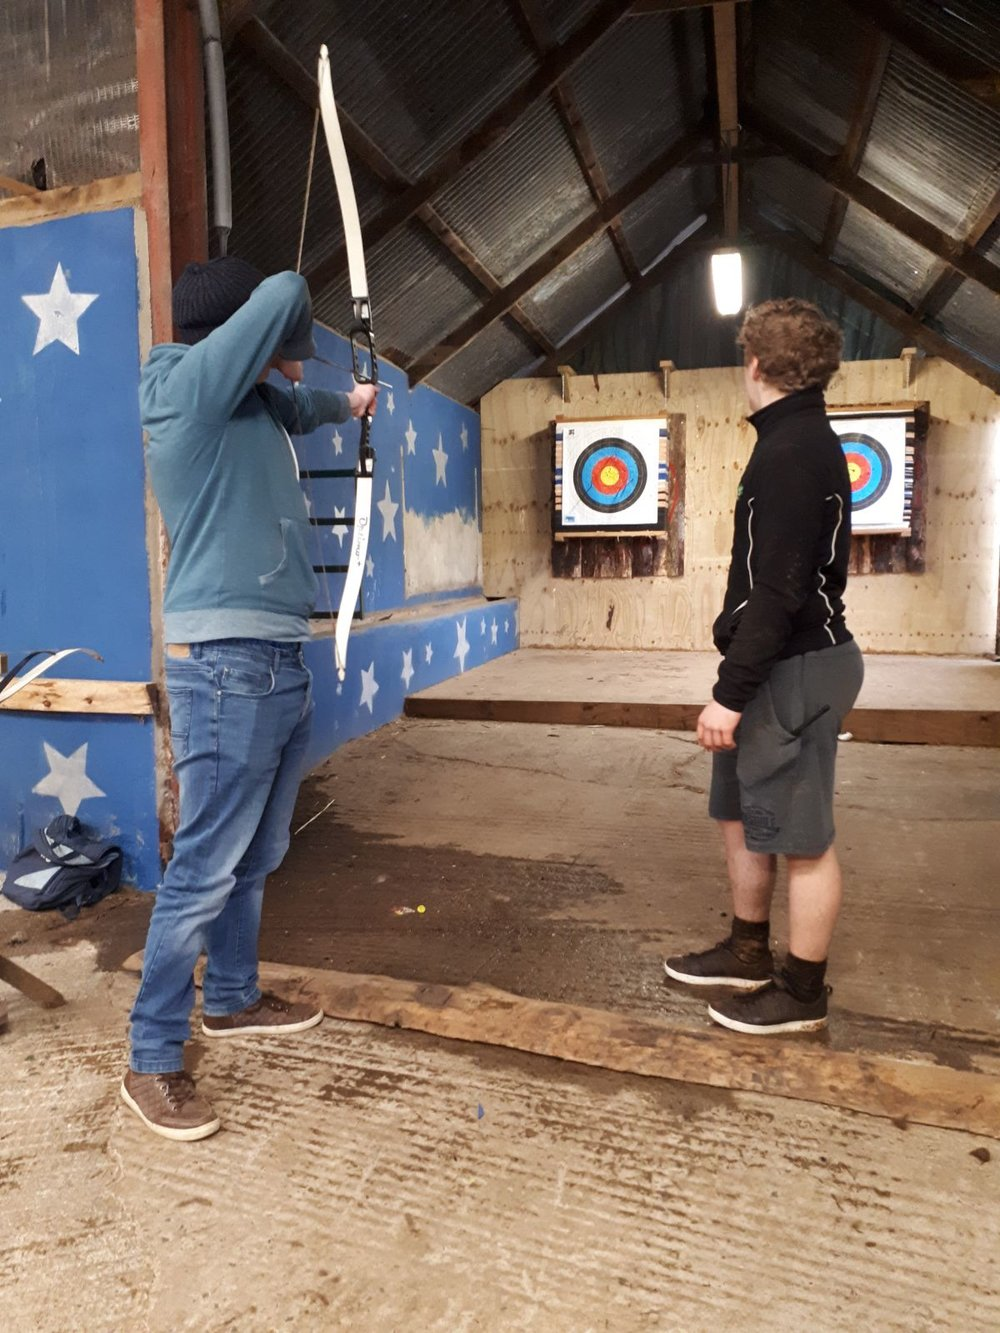 niall archery.jpg